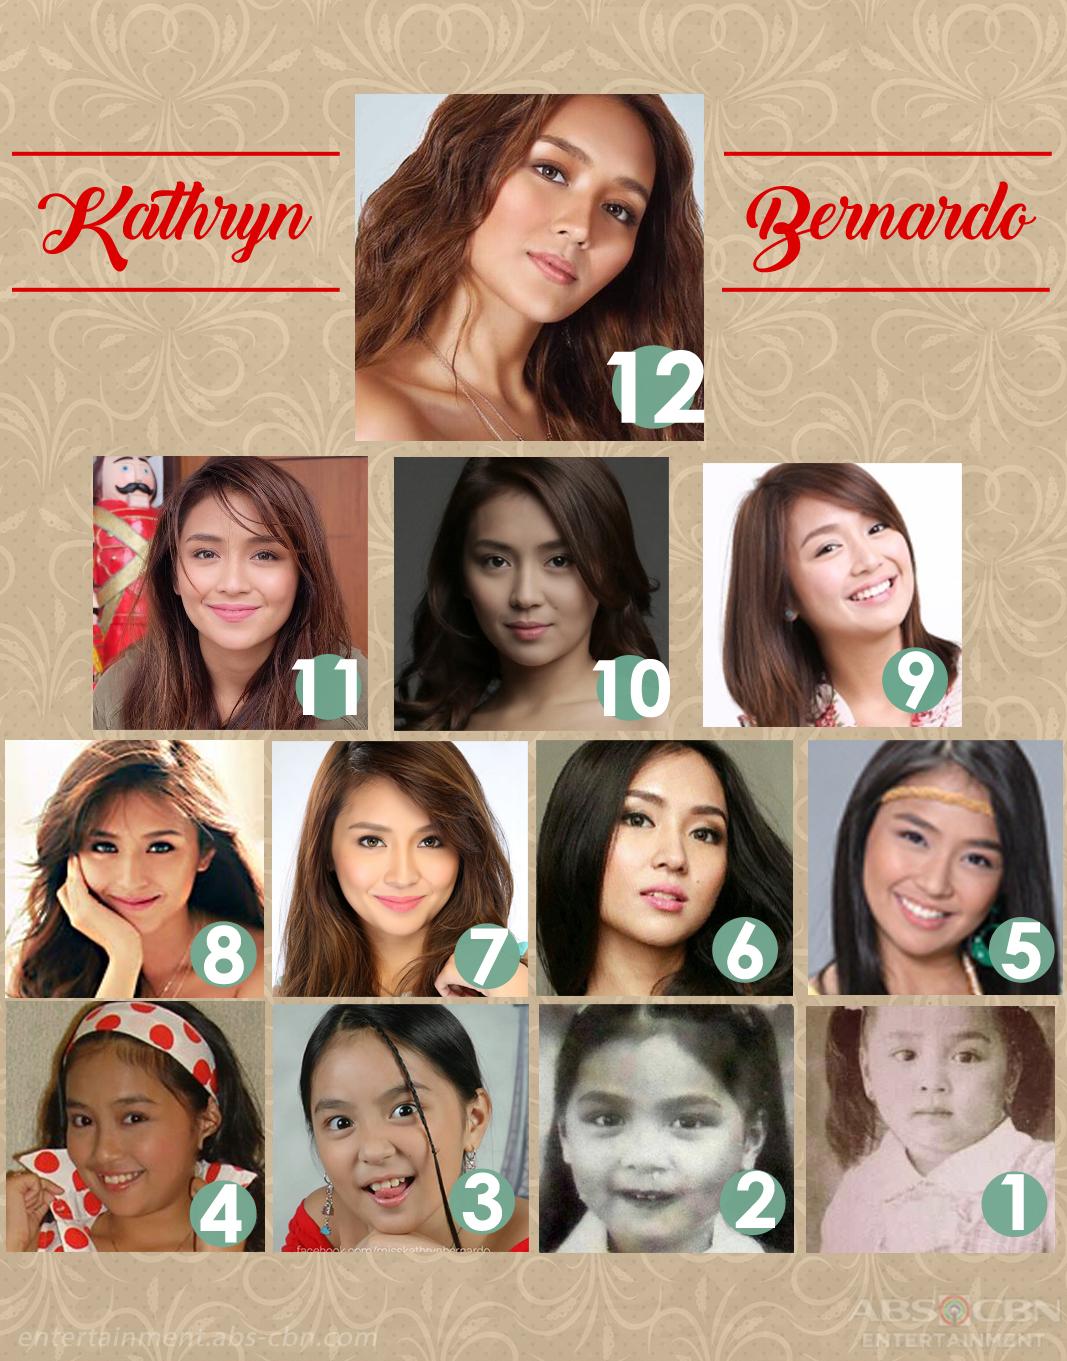 LOOK Kathryn Bernardo through the years 1